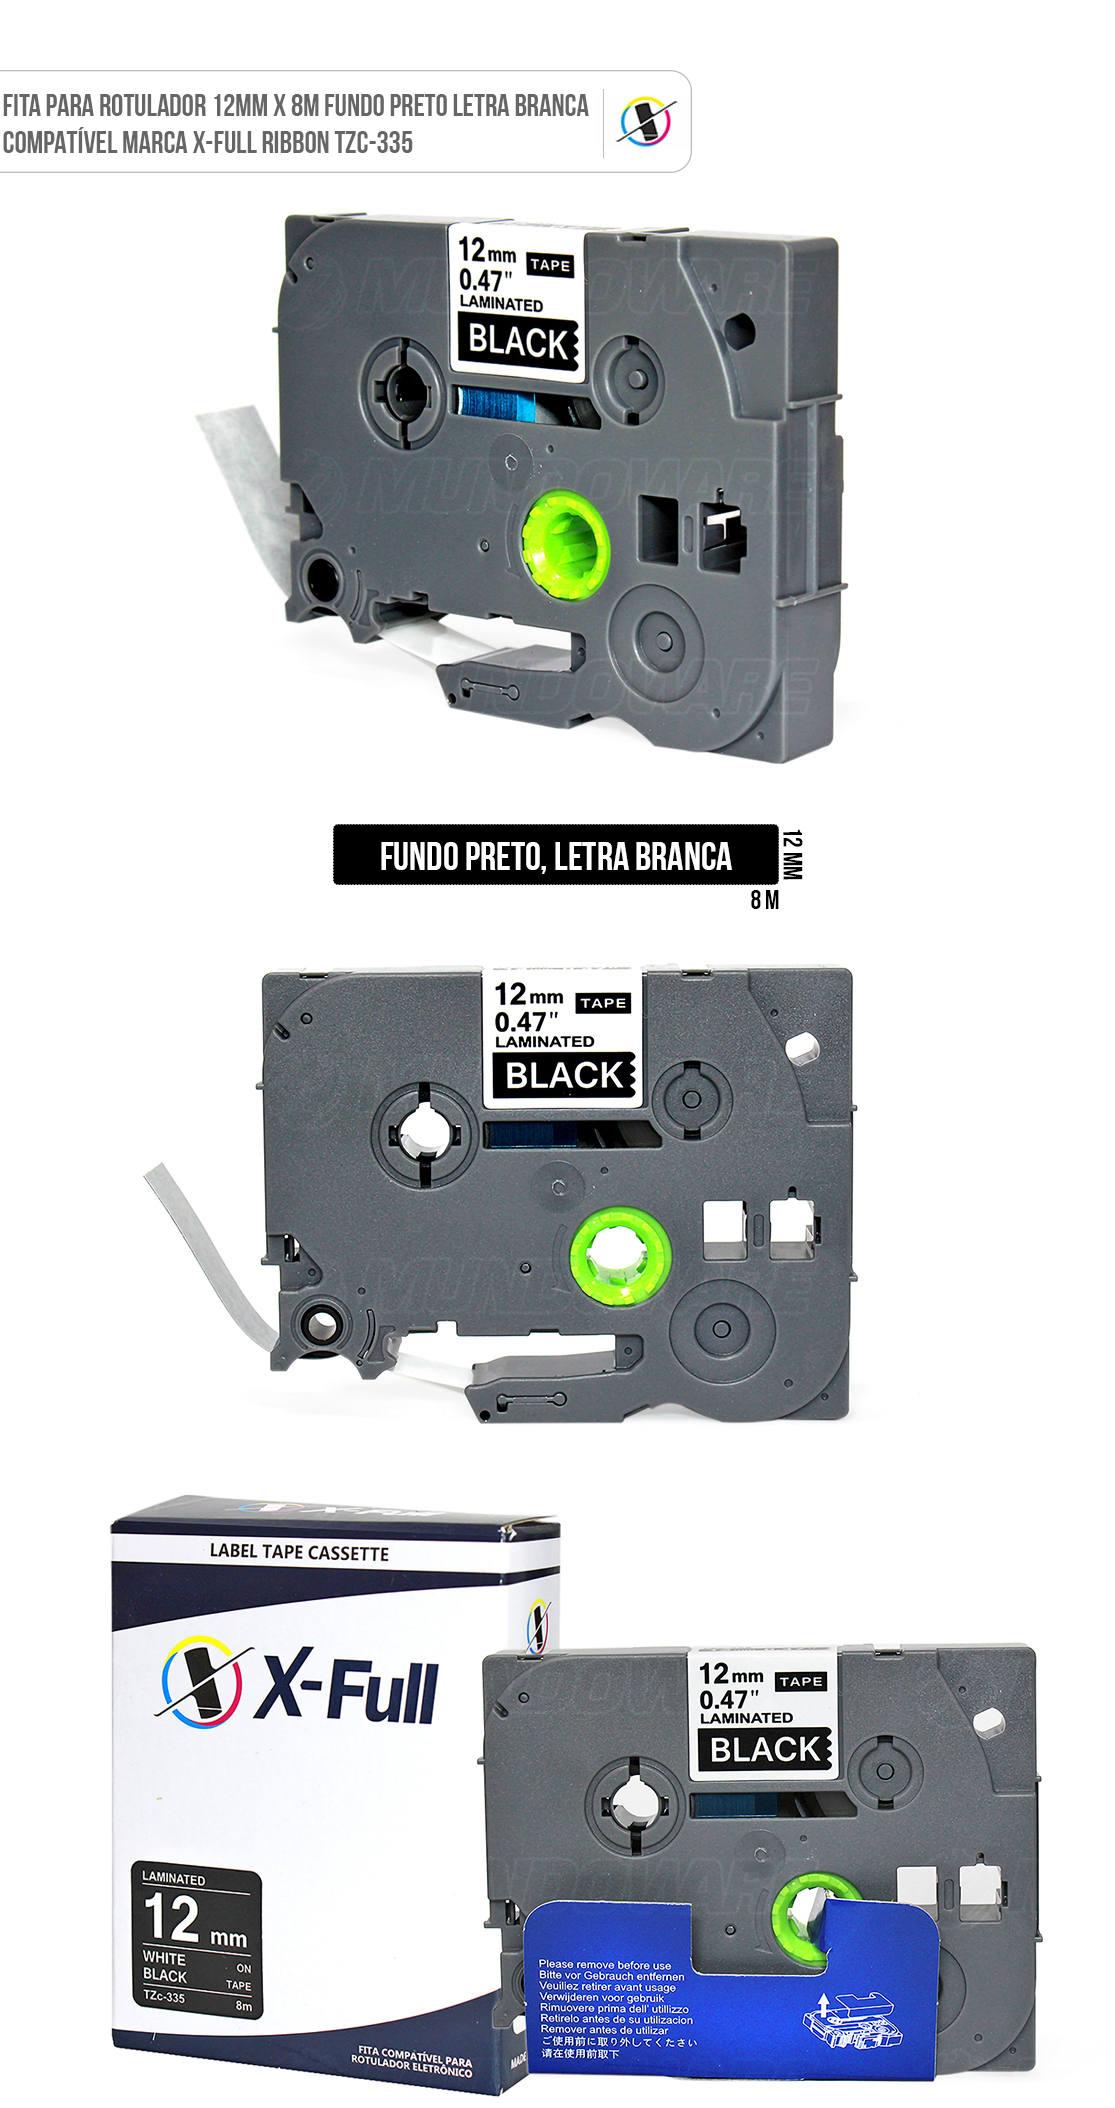 Fita Compatível para Rotulador Marca X-Full Ribbon Referência TZc-335 TZe-335 TZ-335 12mm x 8m Preto/Branco para Brother